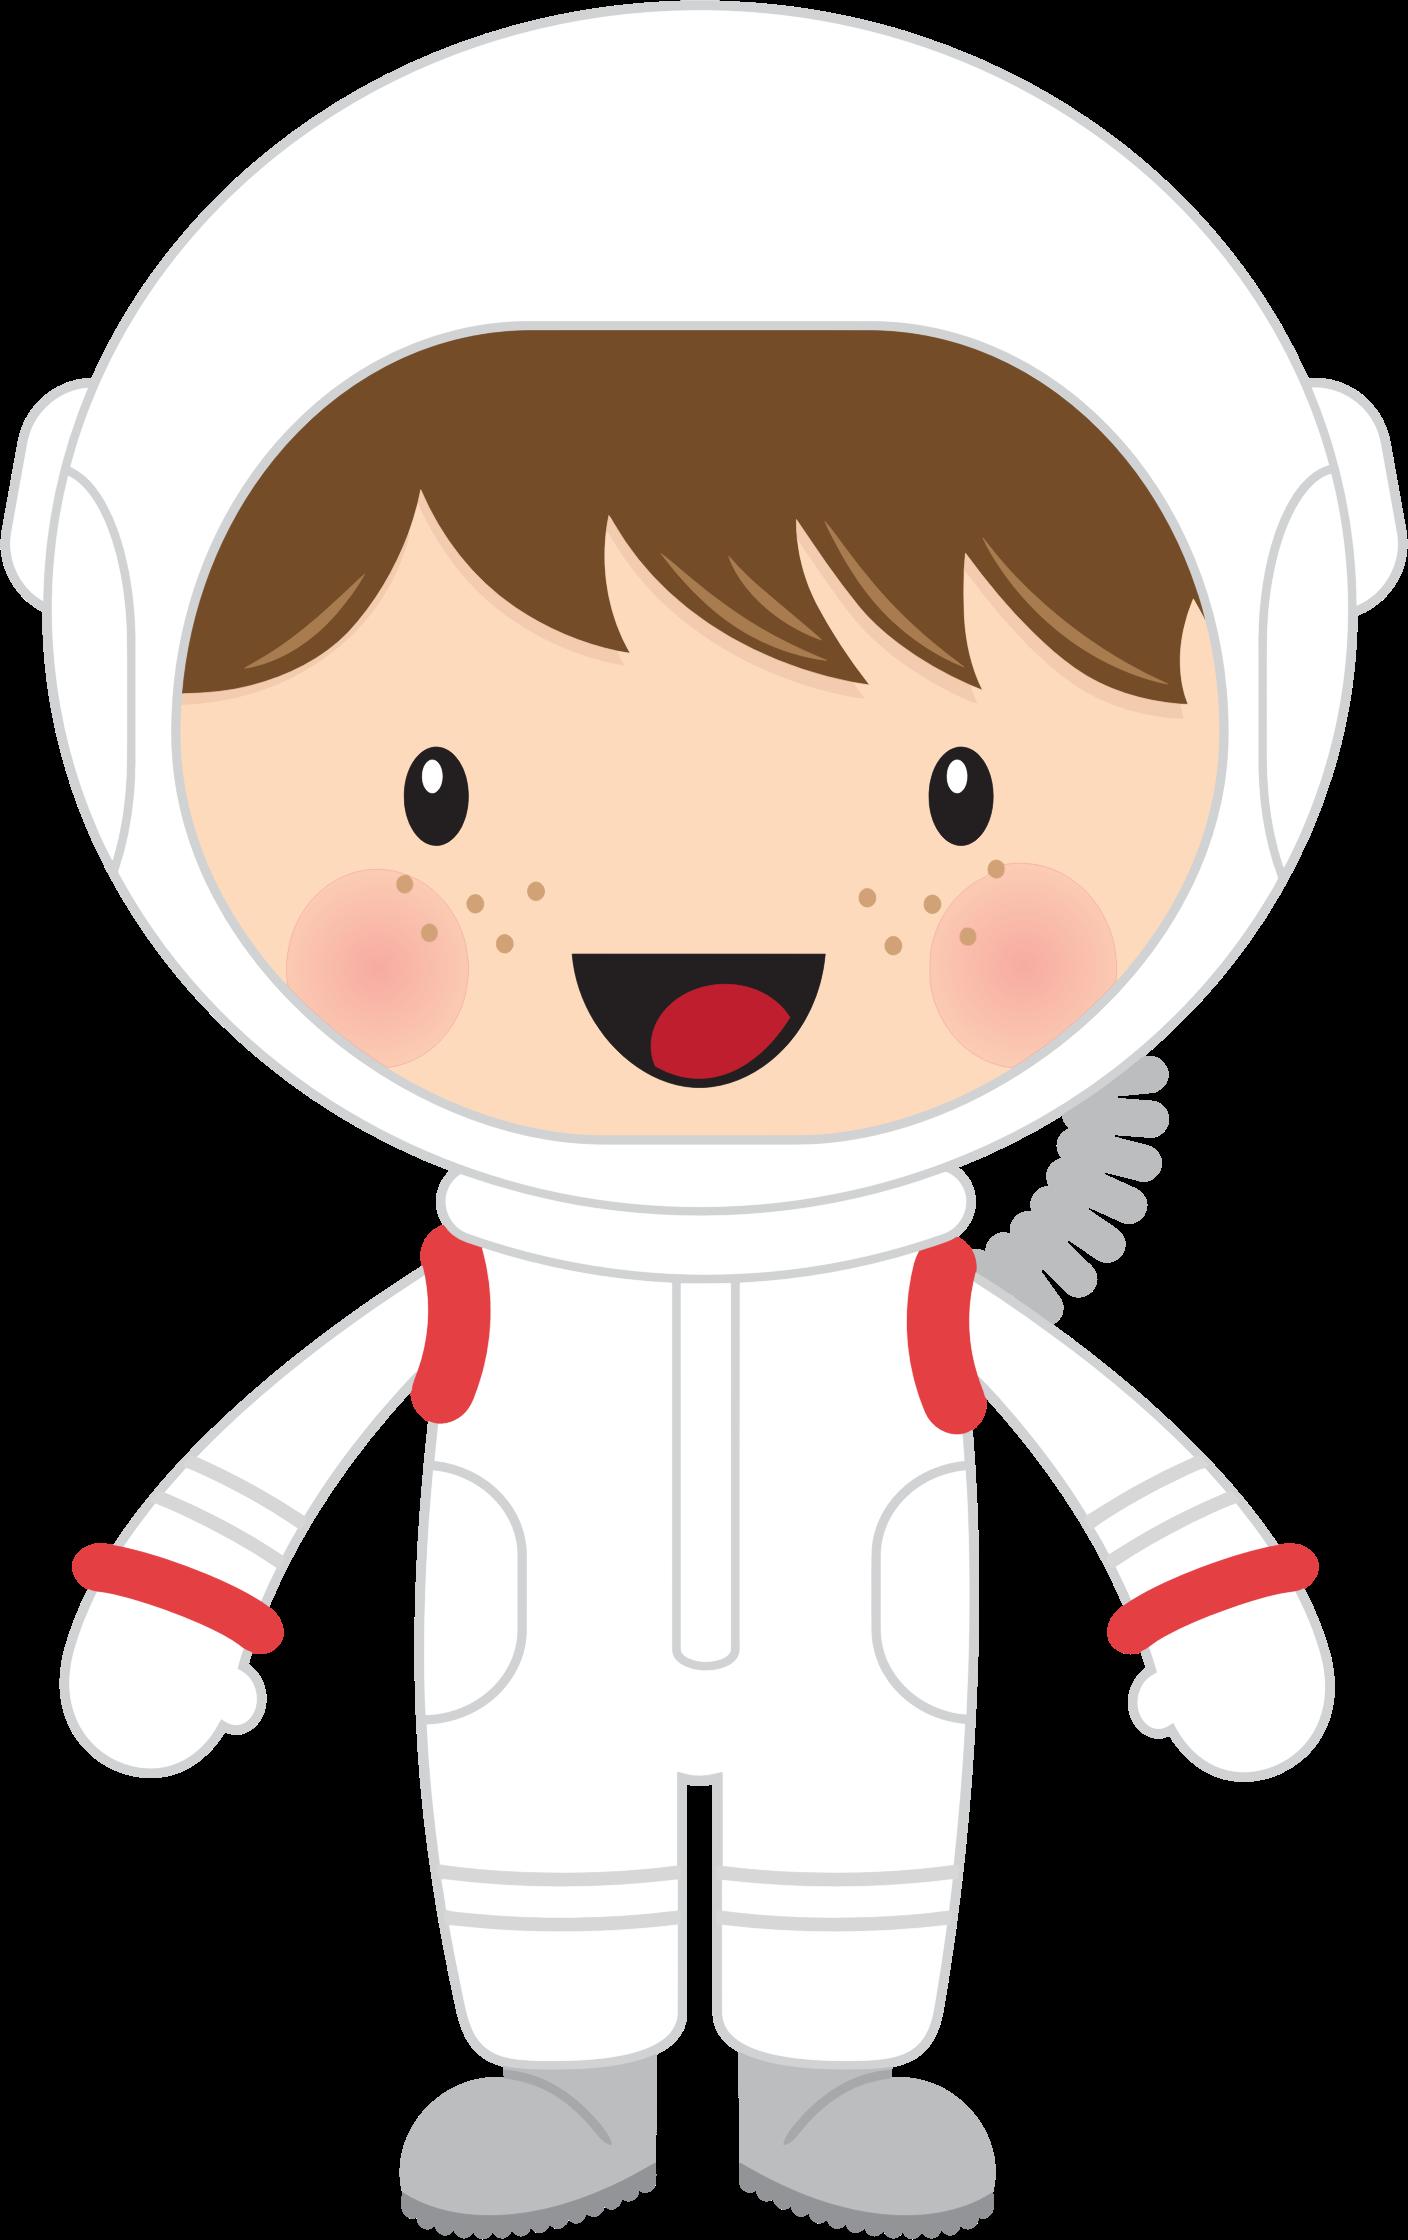 Little boy astronaut by. Planeten clipart birthday